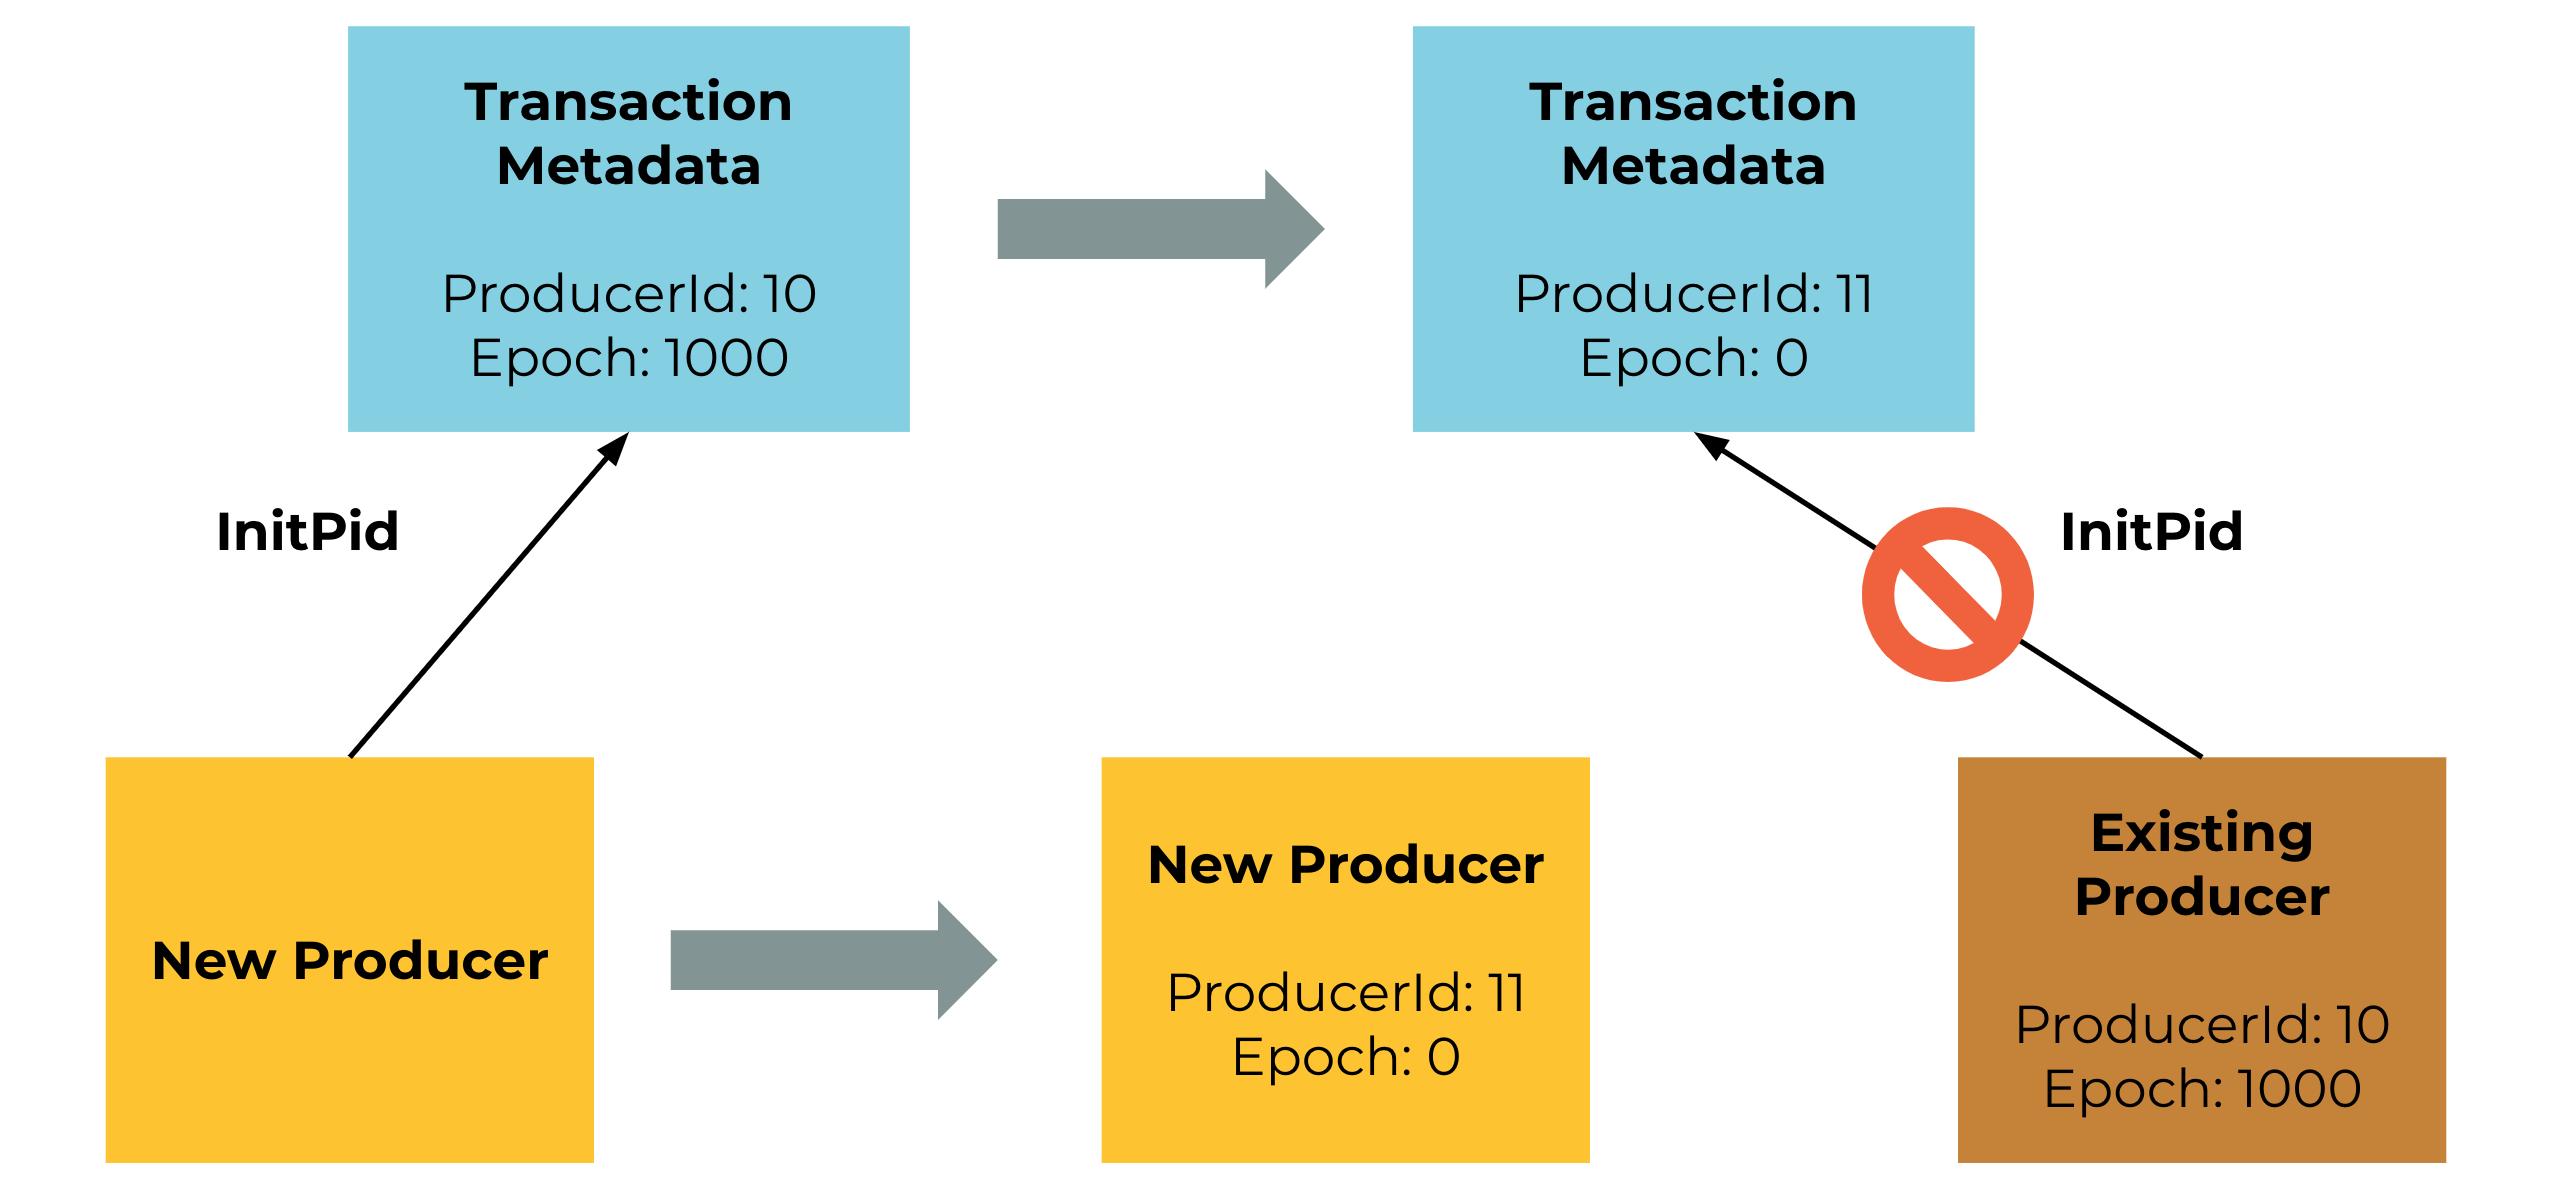 New Producer   Transaction Metadata   Existing Producer